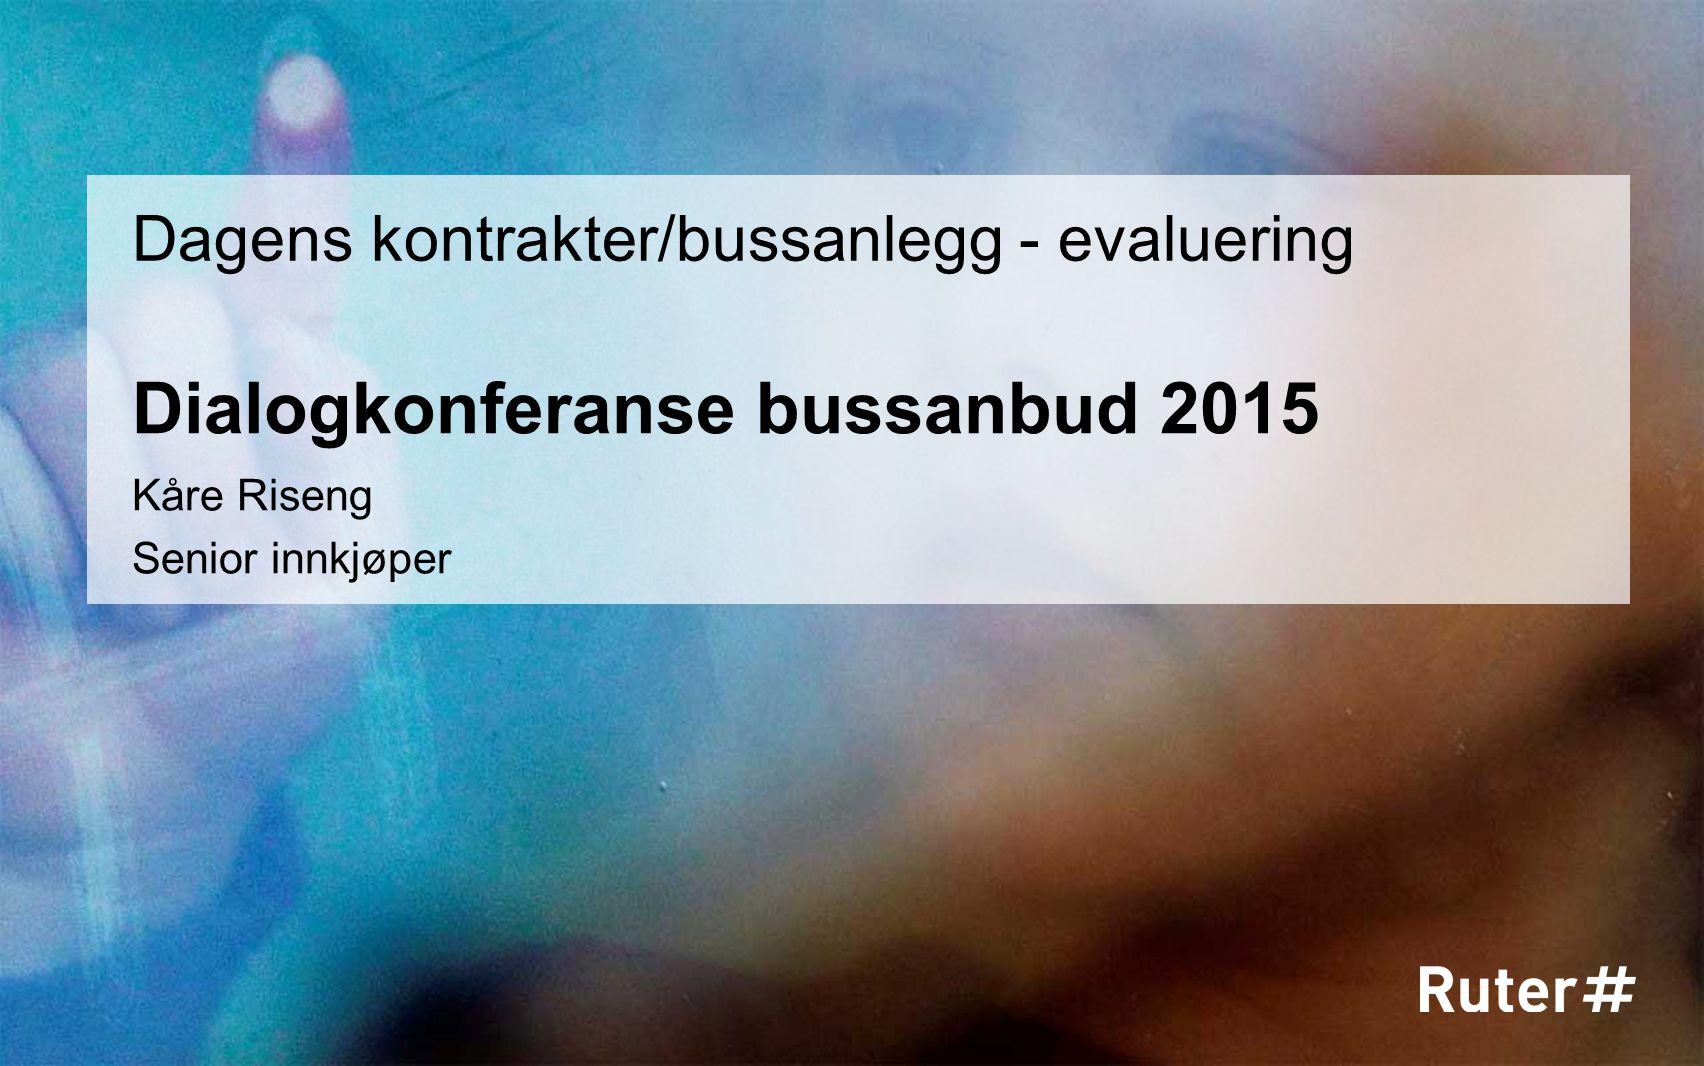 Dialogkonferanse bussanbud 2015